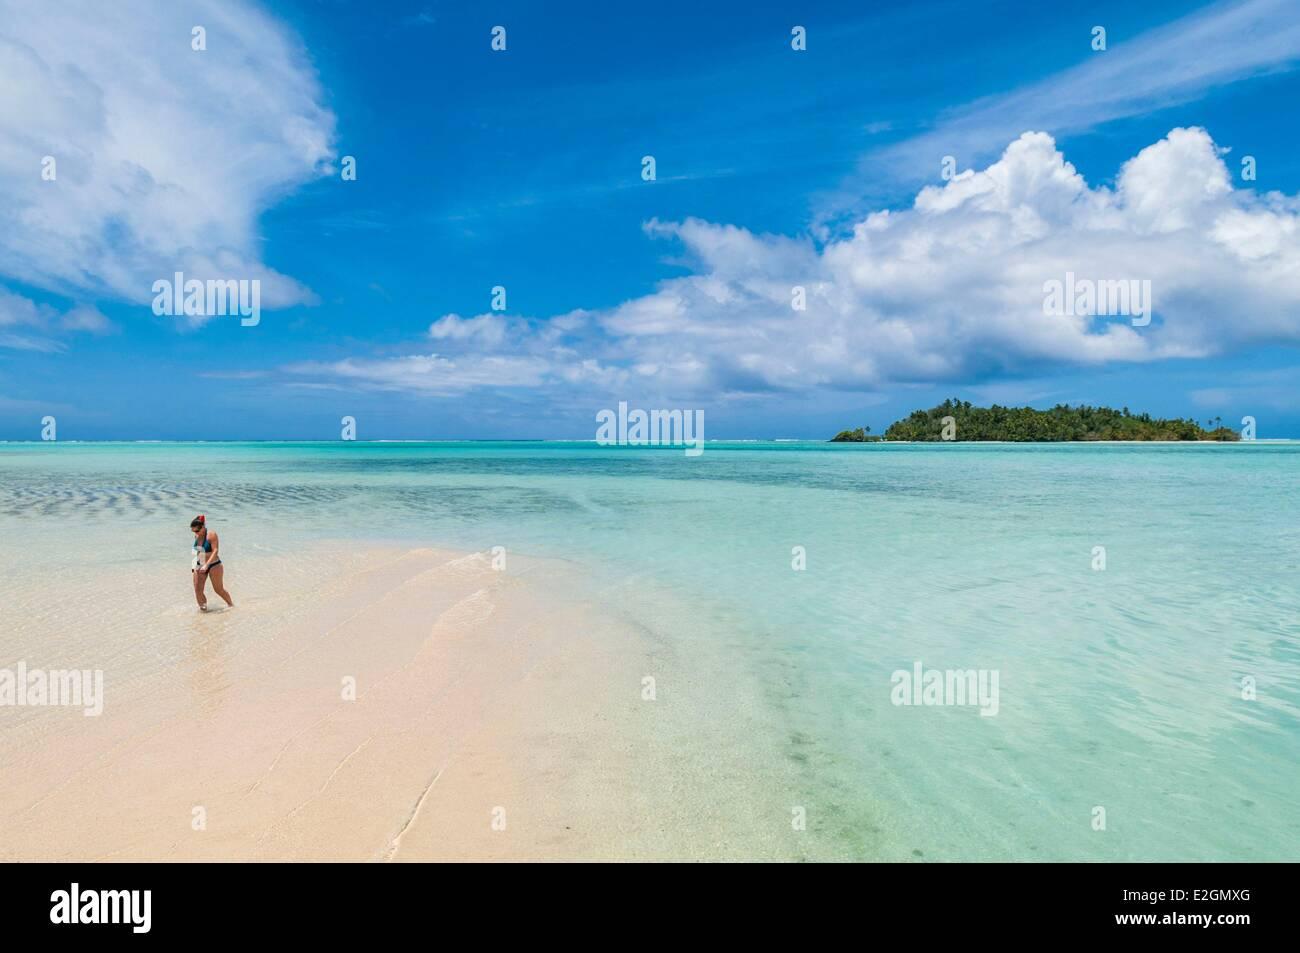 Cook Islands Aitutaki Island lagoon beach of One Foot Island atoll also called Tapuaetai - Stock Image